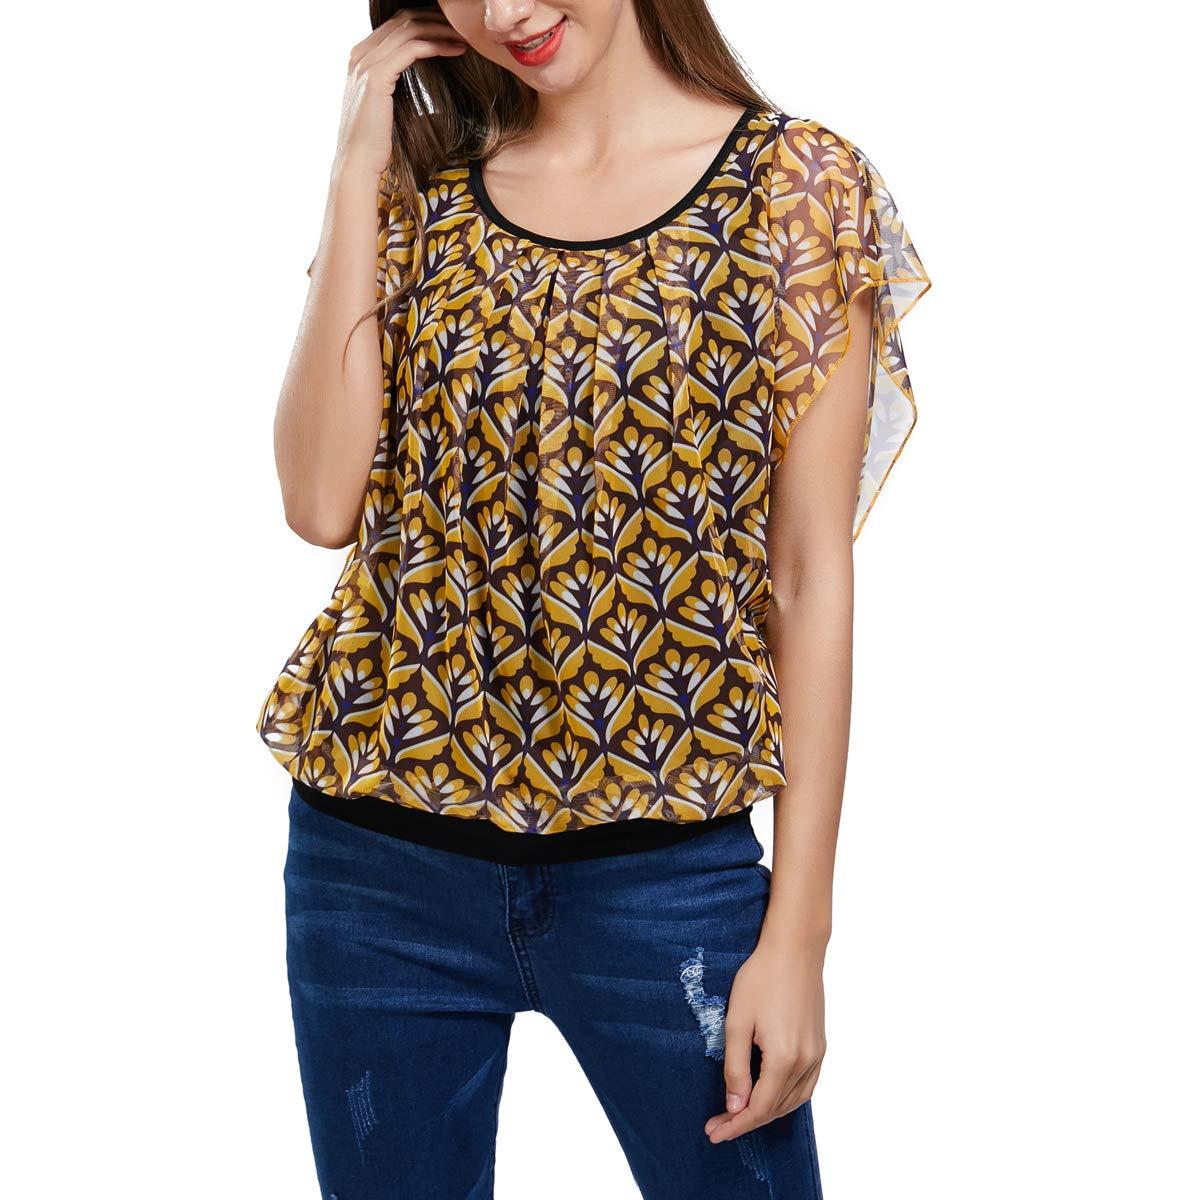 Naladoo Summer Women O-Neck Tops Casual Short Sleeve Cotton T-Shirt Short Blouse